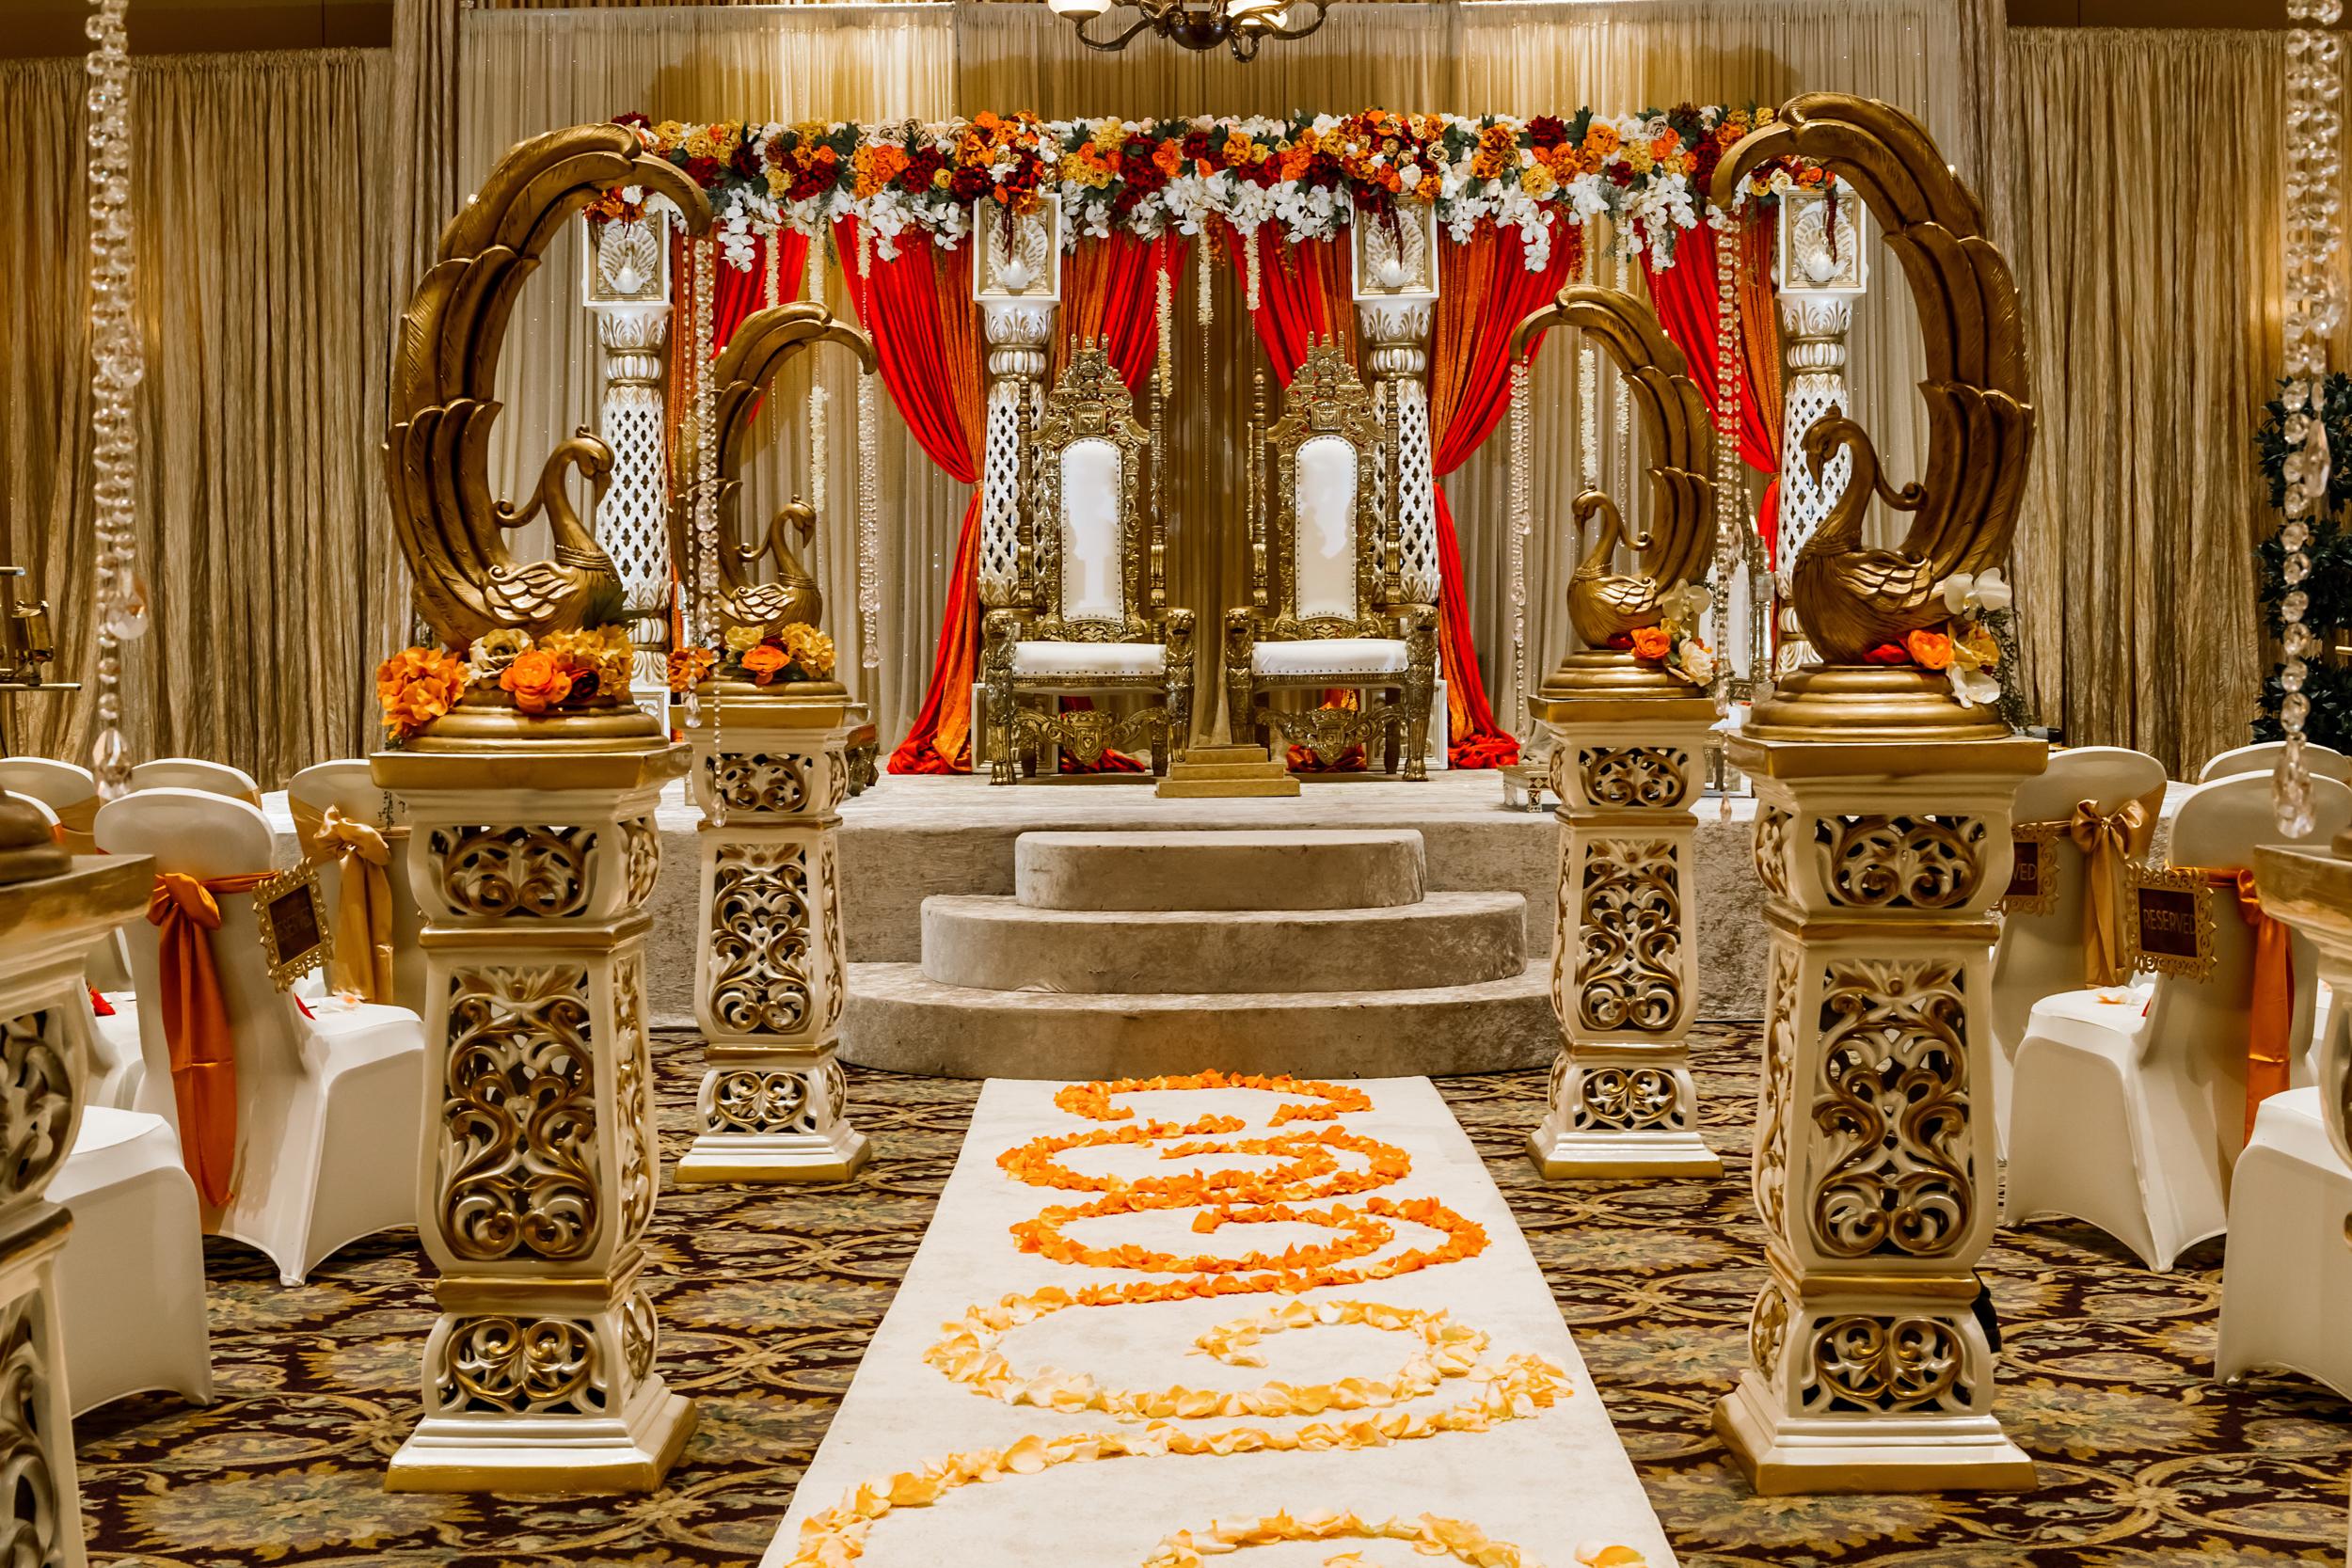 Holy Trinity Church Reception center indian wedding